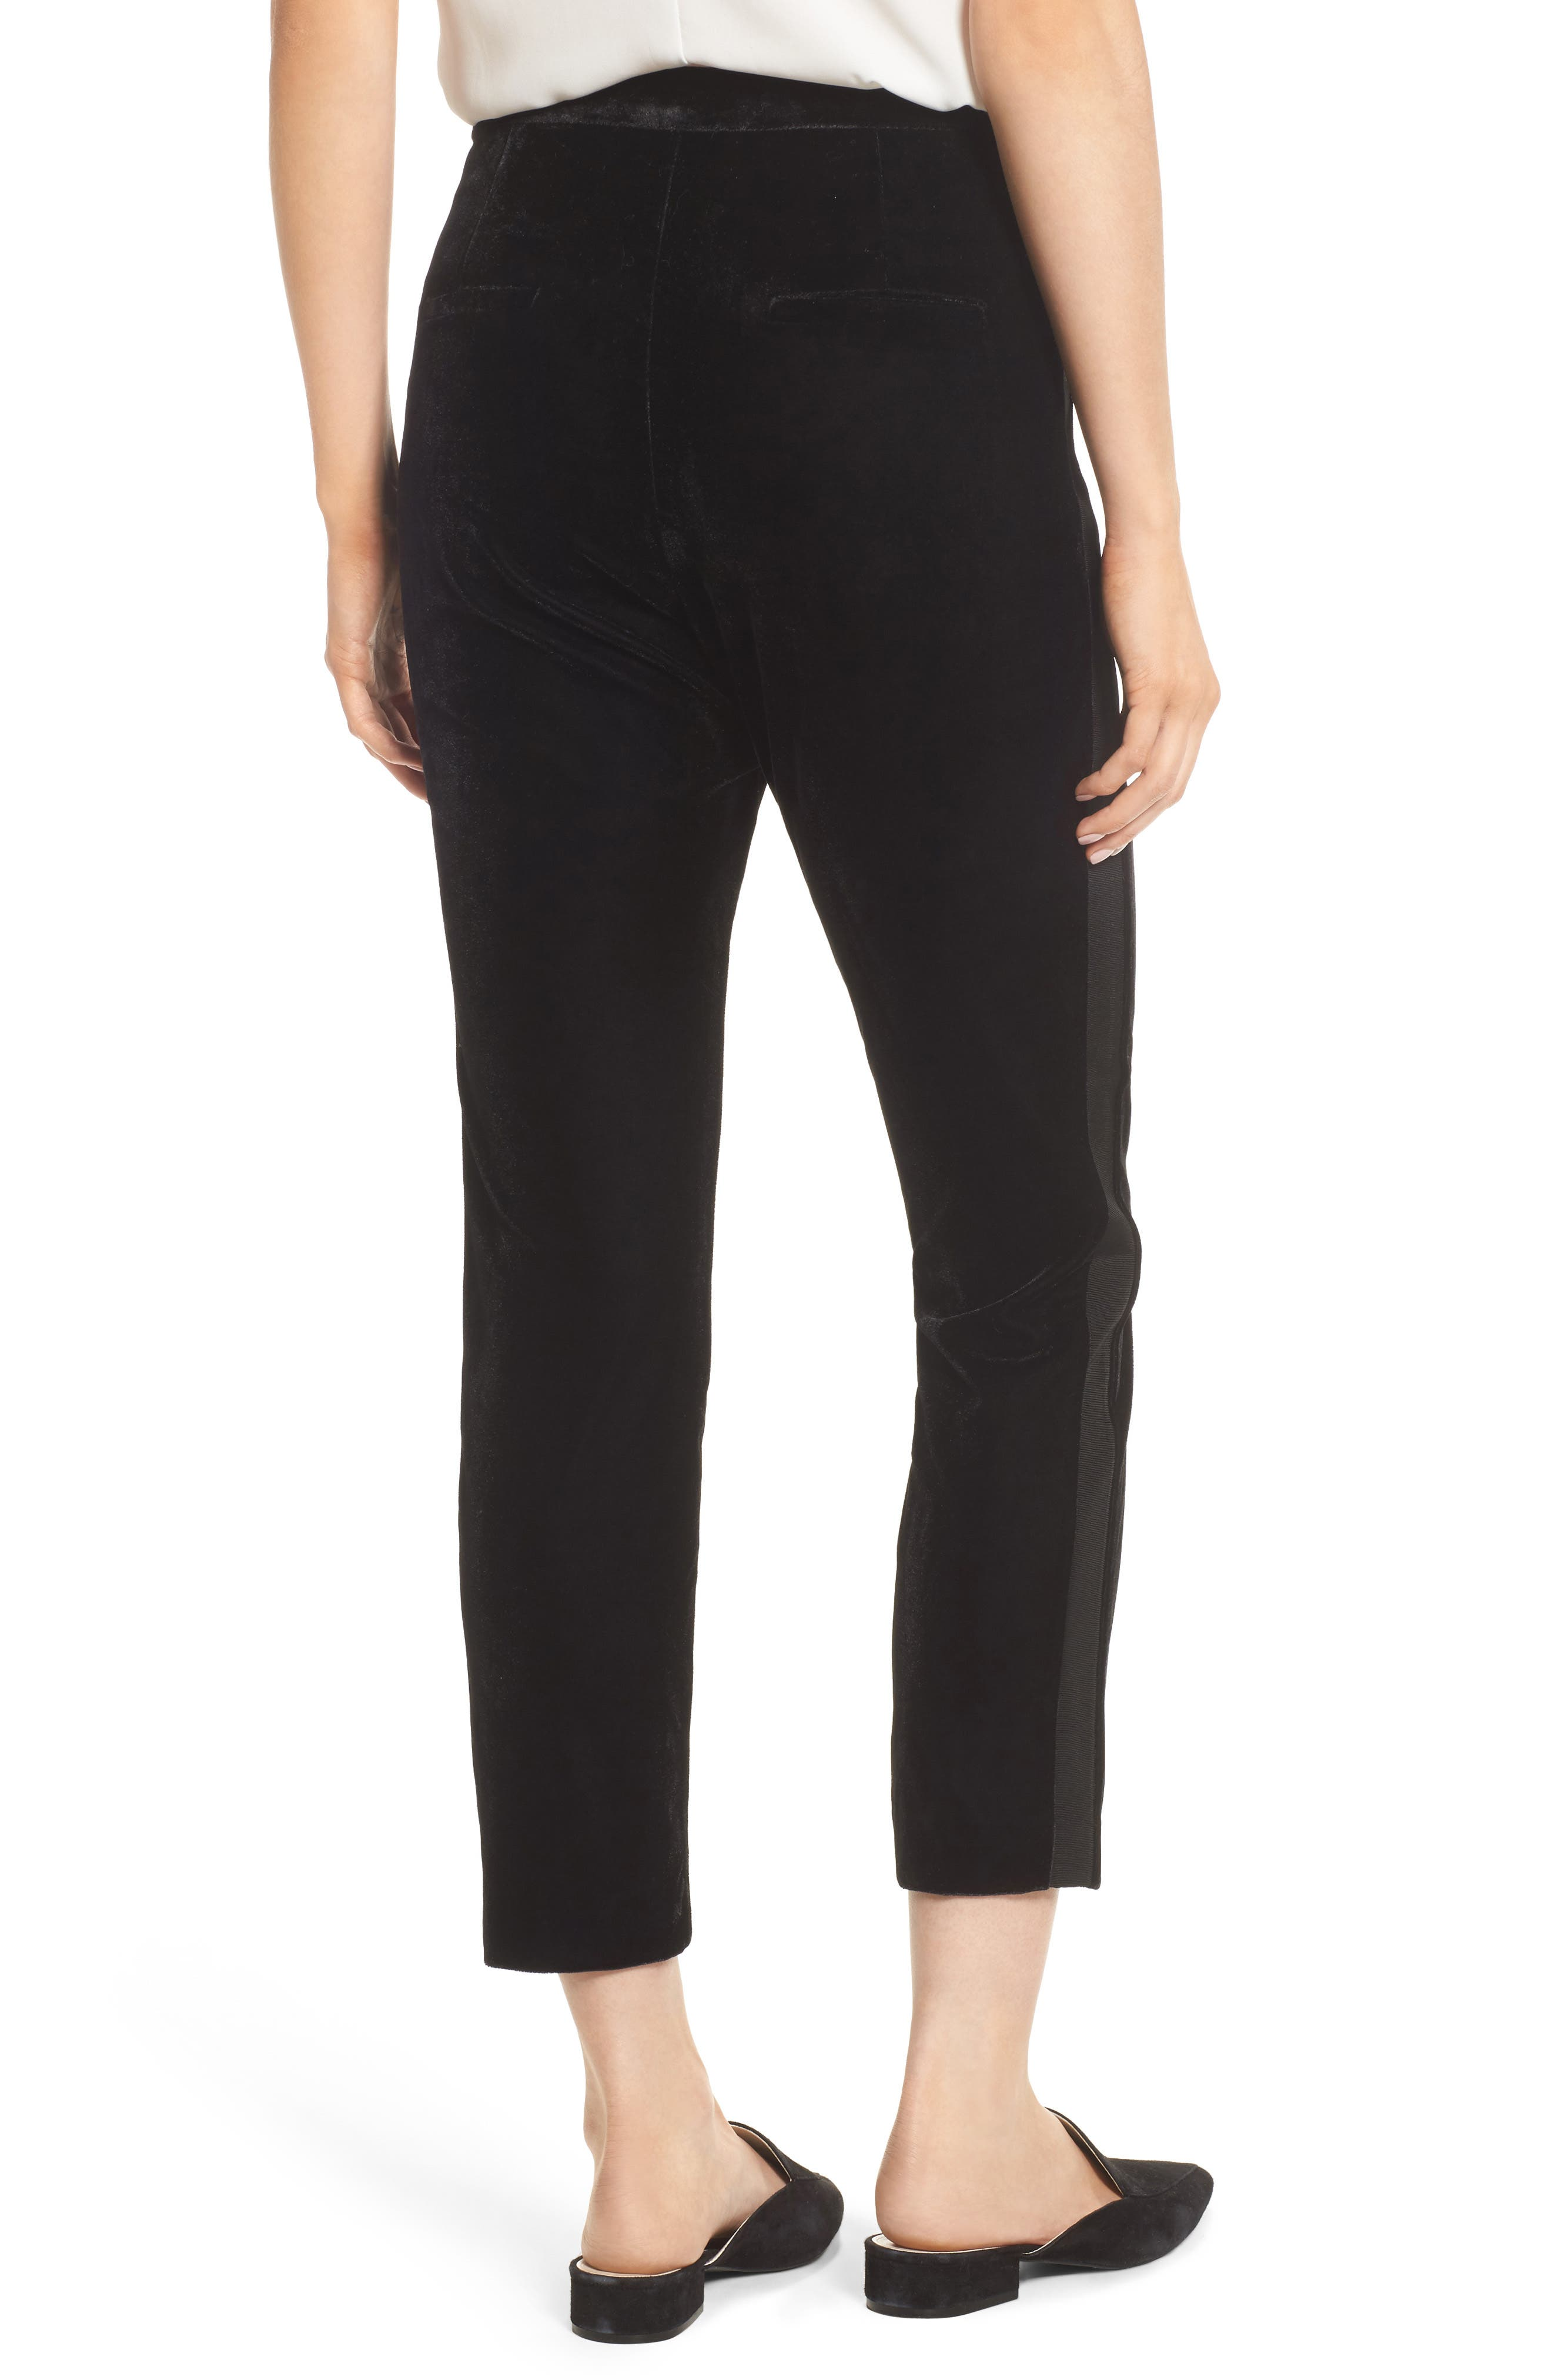 Evalina Velvet Crop Skinny Pants,                             Alternate thumbnail 2, color,                             001